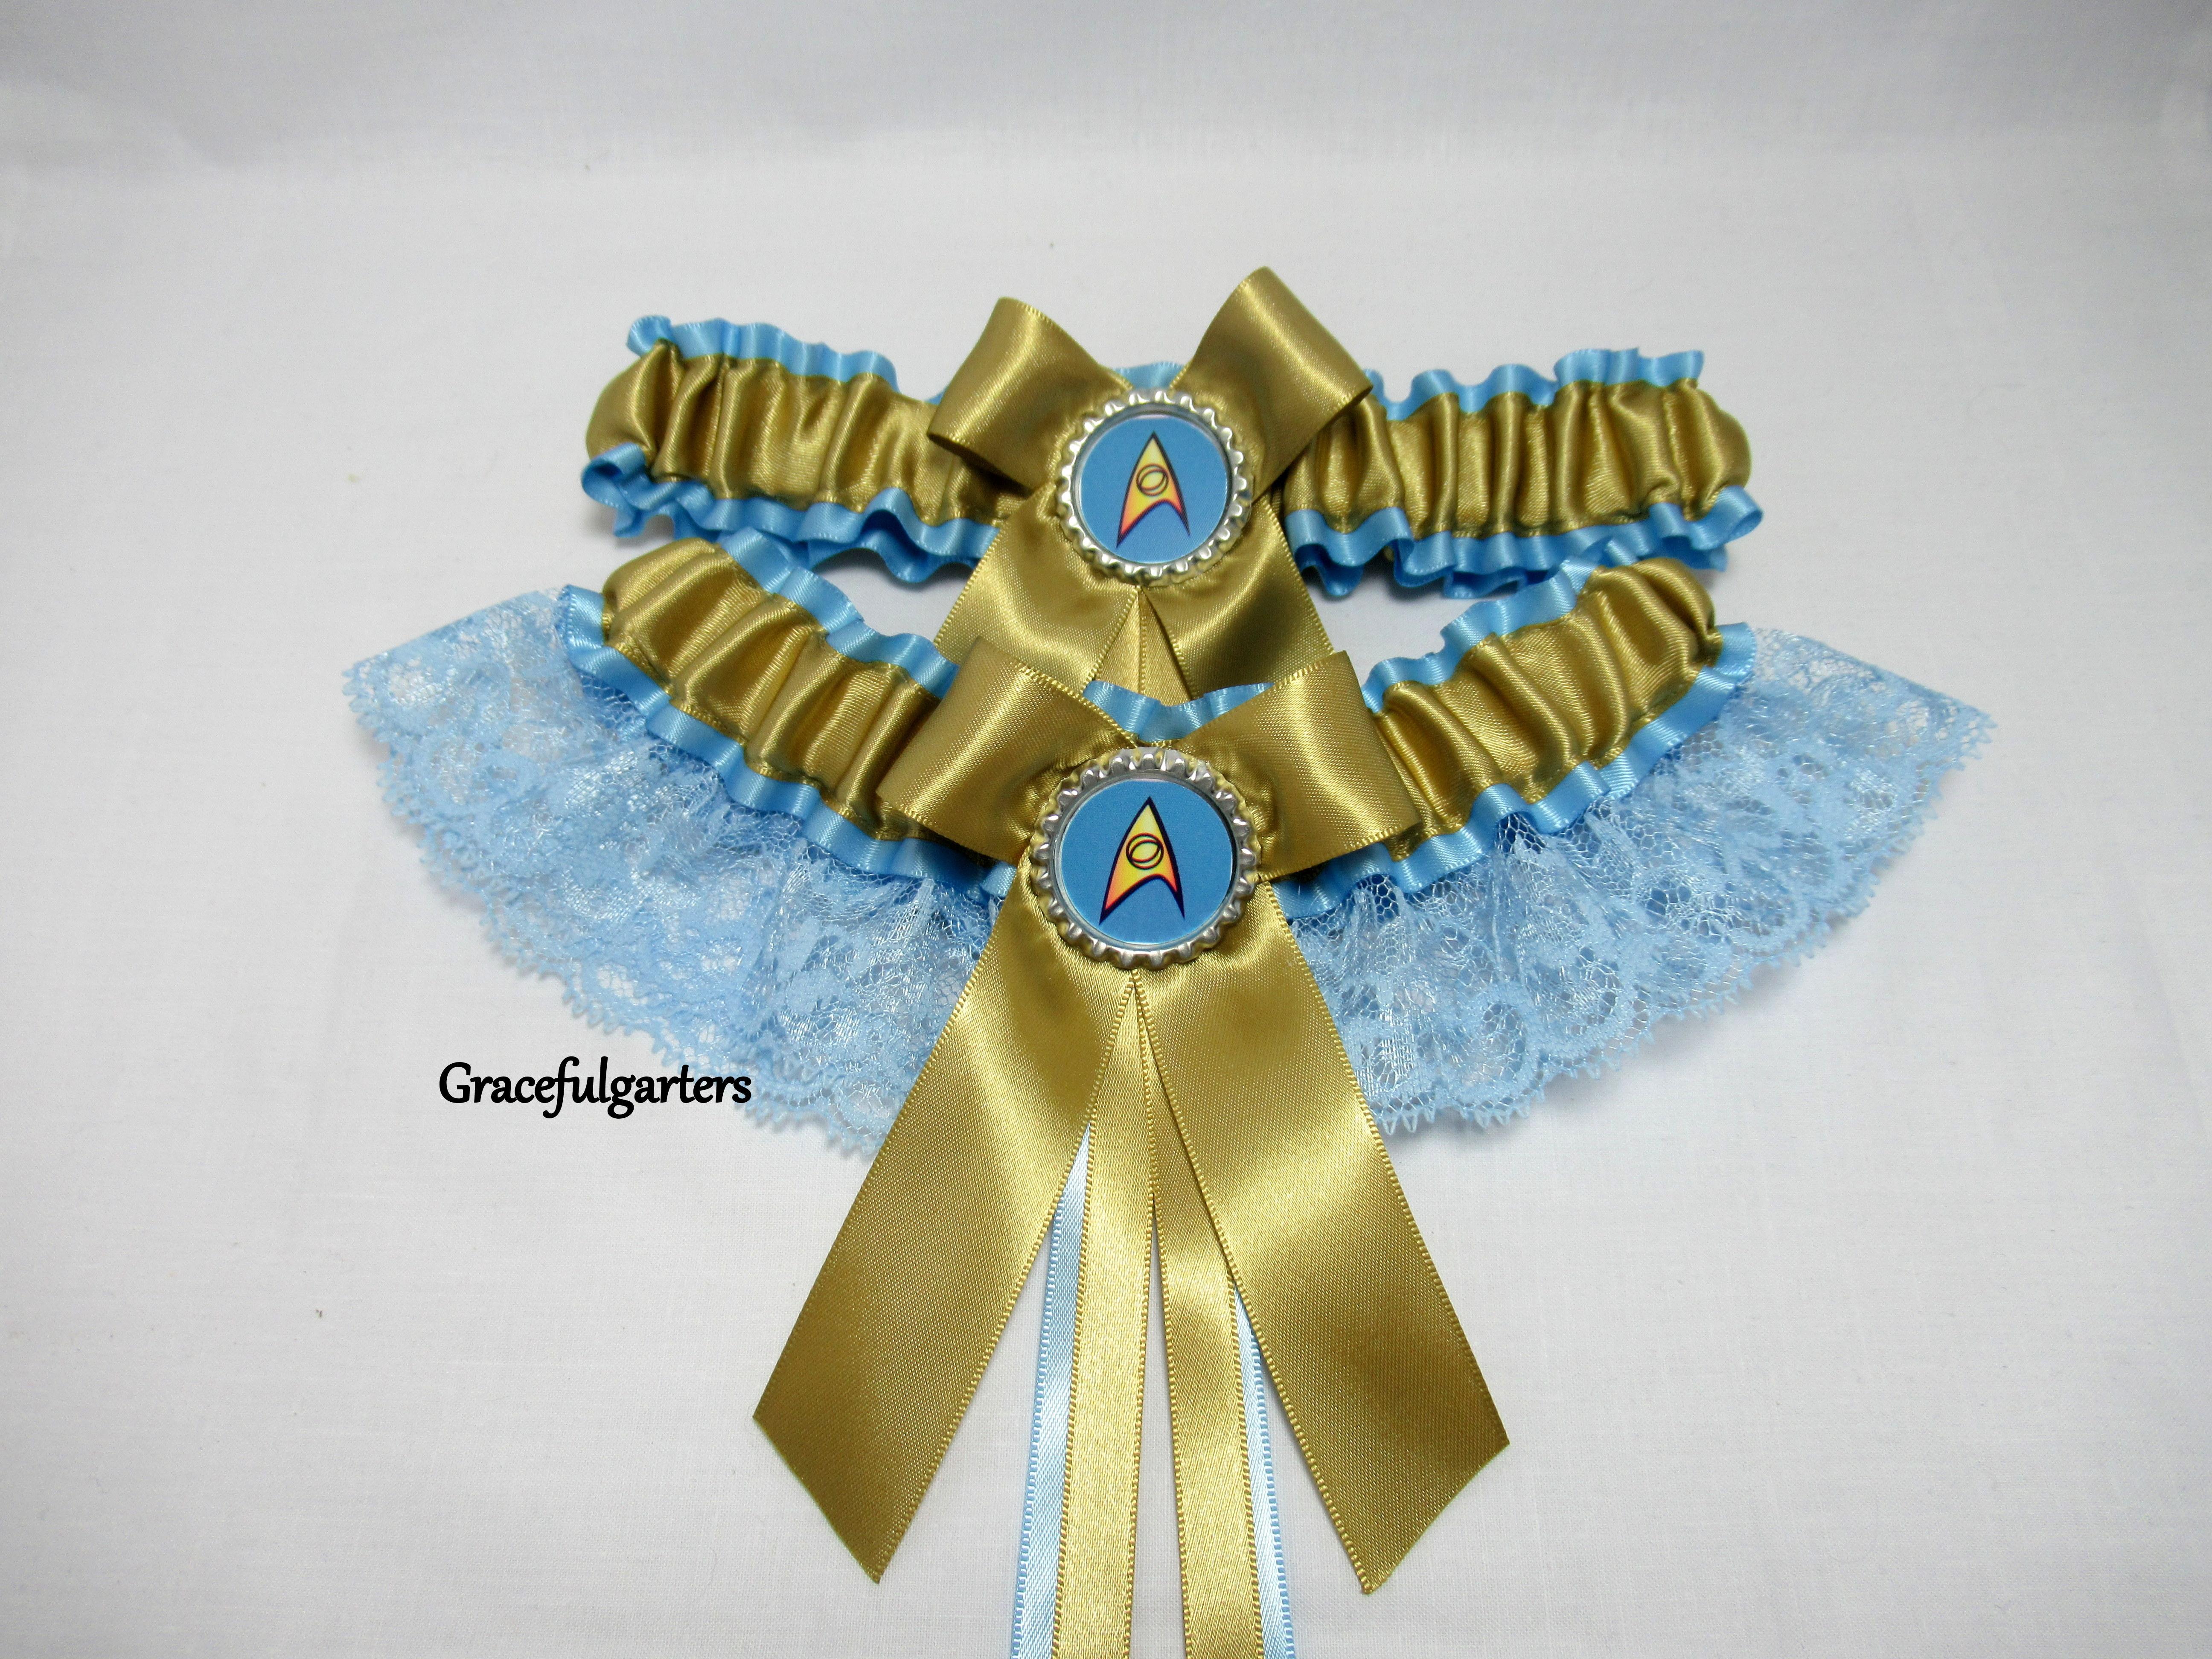 26c4dbb4f3c Star Trek Lace Bridal Wedding Garter Set - GracefulGarters